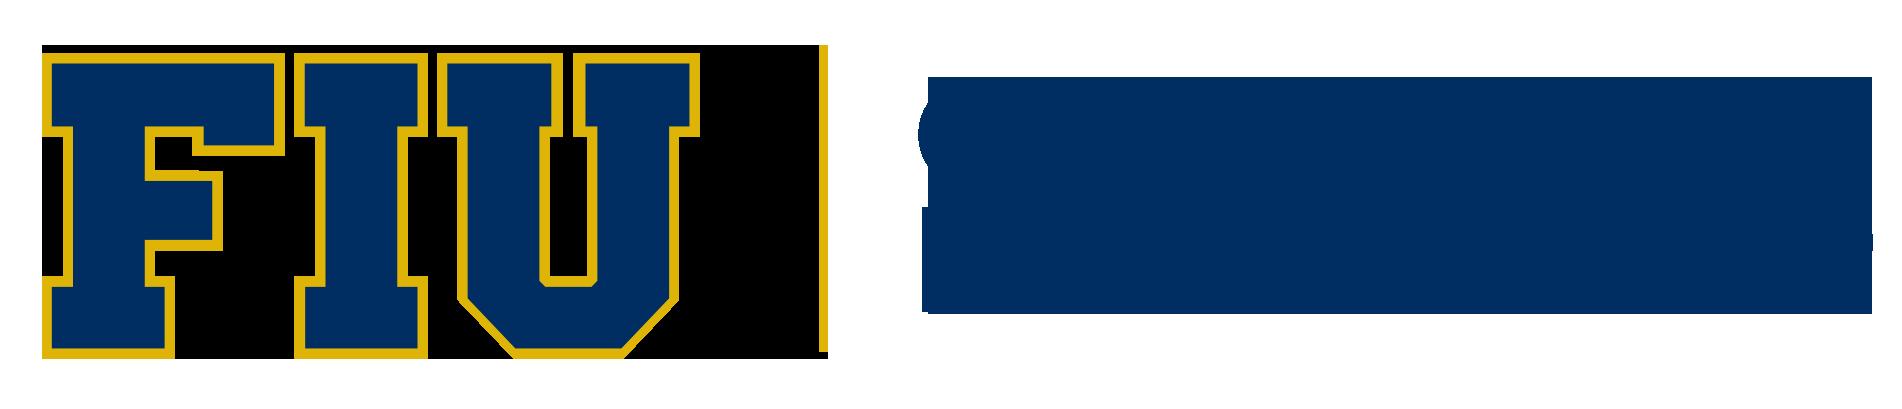 FIU Office of Internal Audit